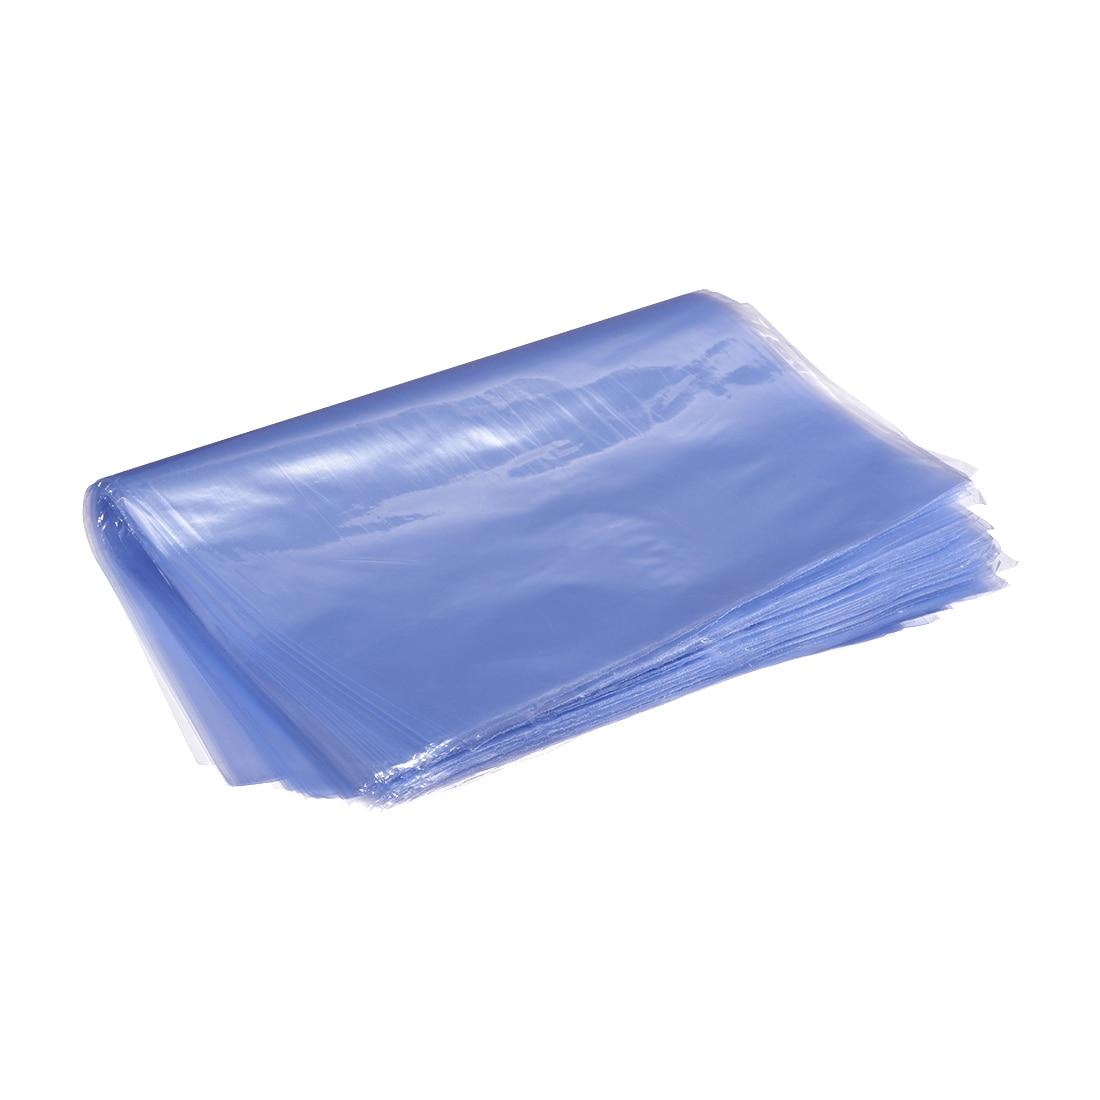 Bolsas retráctiles uxcell bolsas de envoltura termorretráctil de PVC bolsas de embalaje flexibles encogibles bolsas de sellado de embalaje Industrial